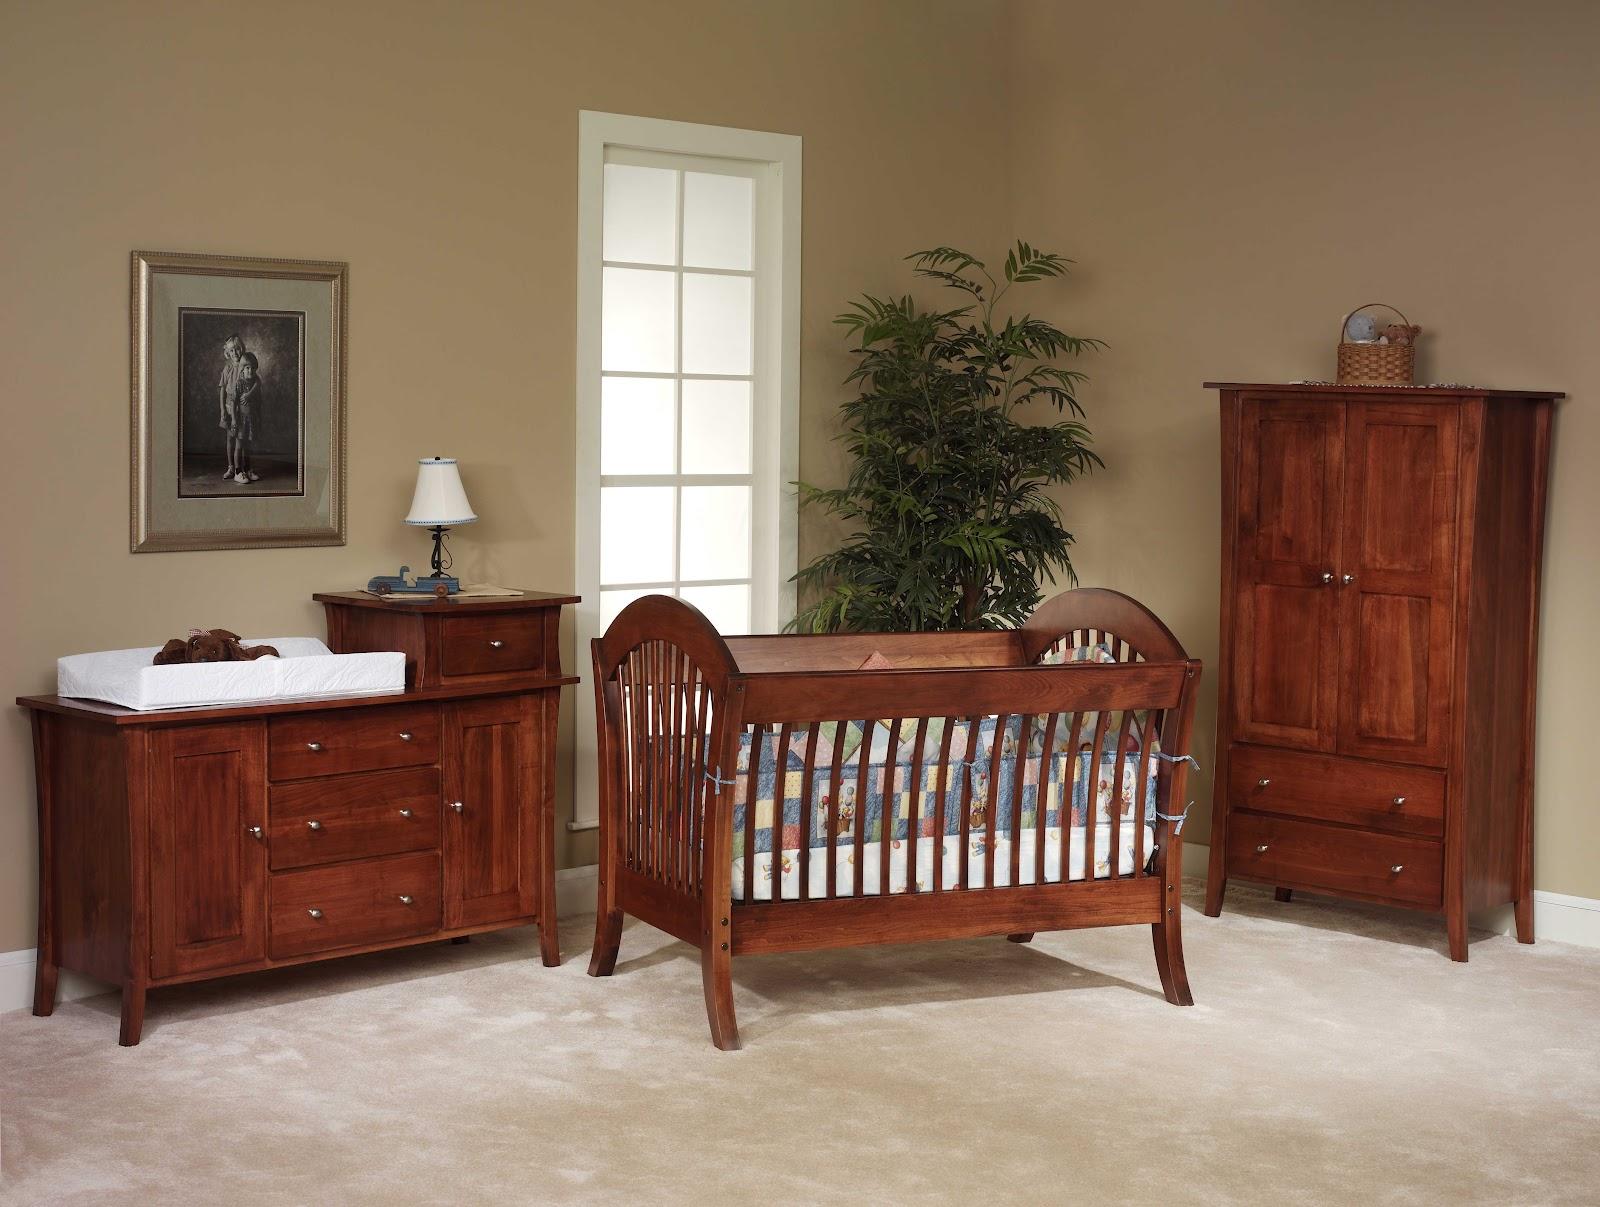 Elmer's Custom Amish Furniture